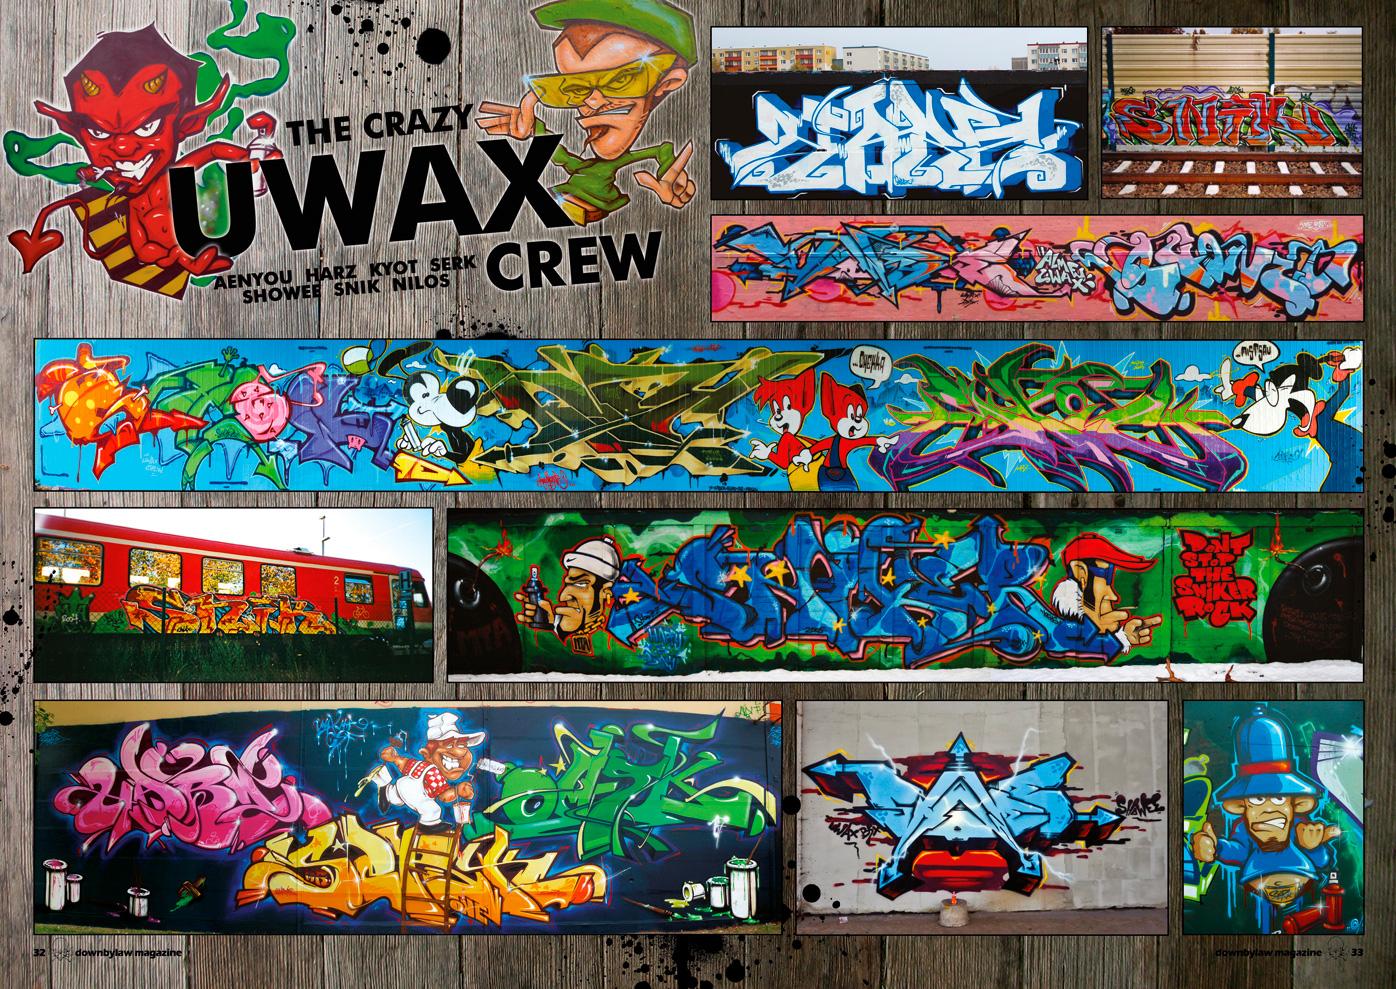 downbylaw_magazine_7_uwax_crew_graffiti